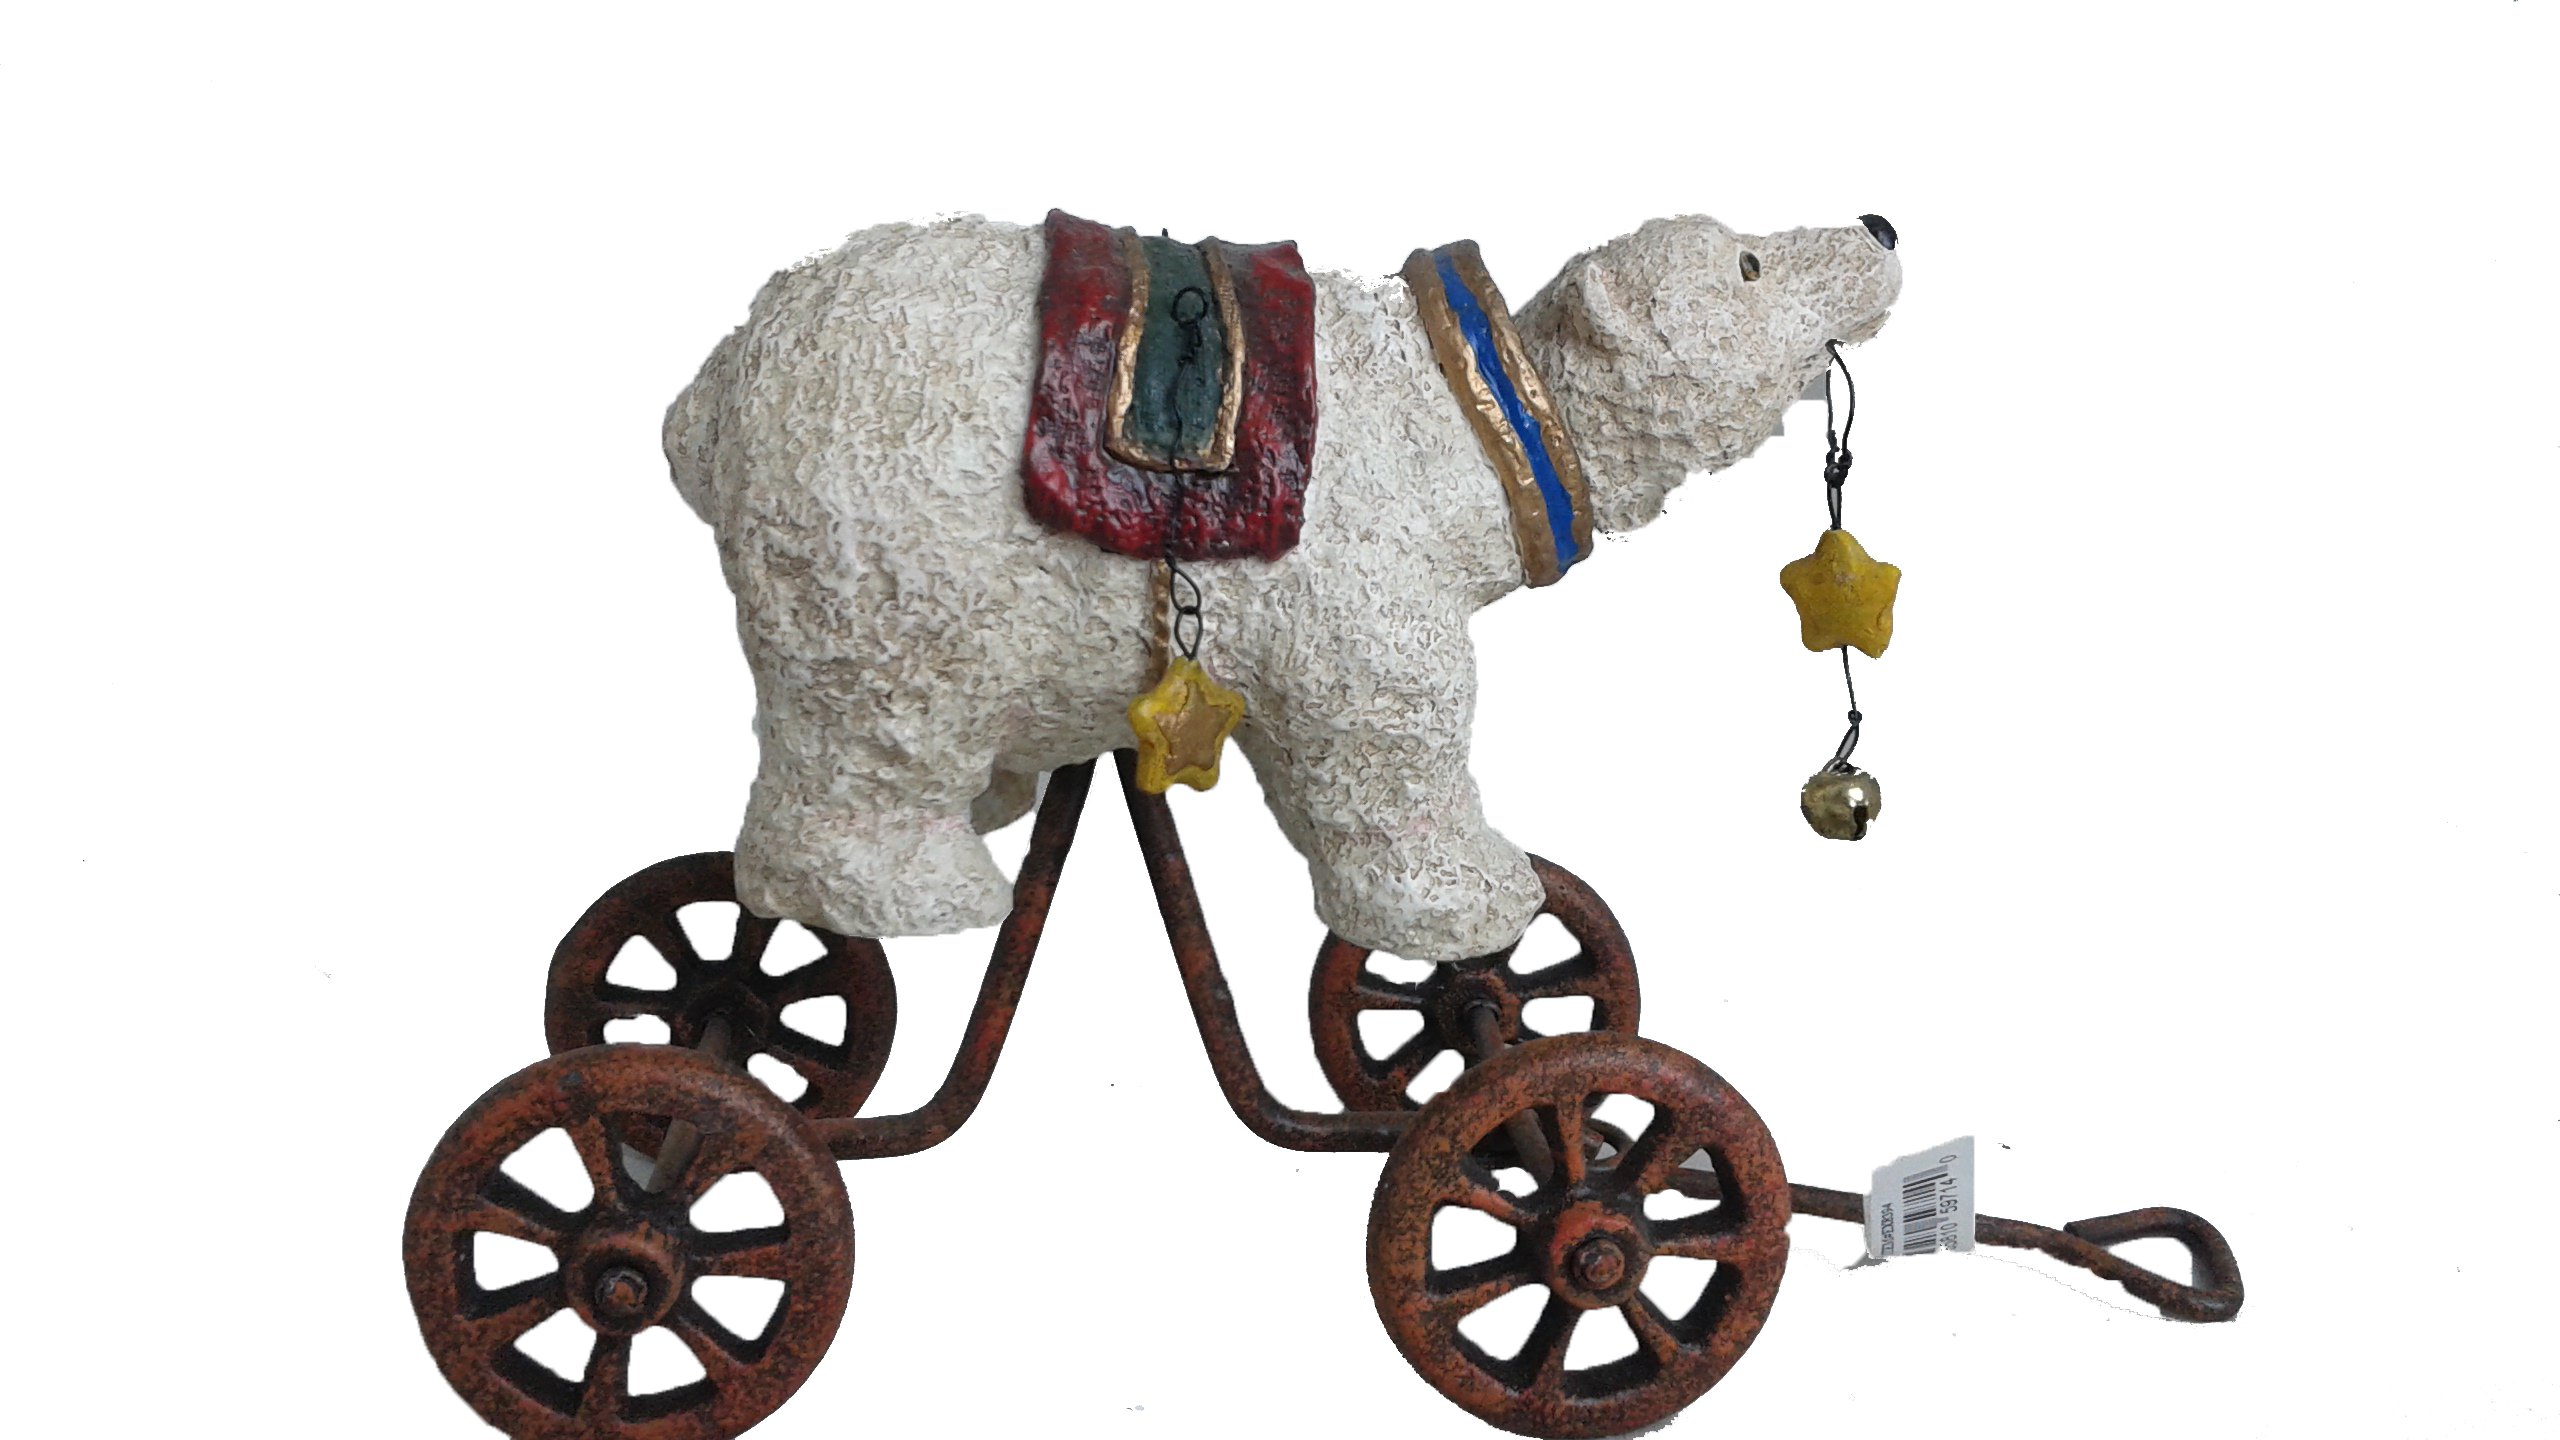 Kurt S. Adler Holiday Antique Circus Animal Pull Ornament | Collectors Edition | Retired Series (White Polar Bear) by Kurt Adler